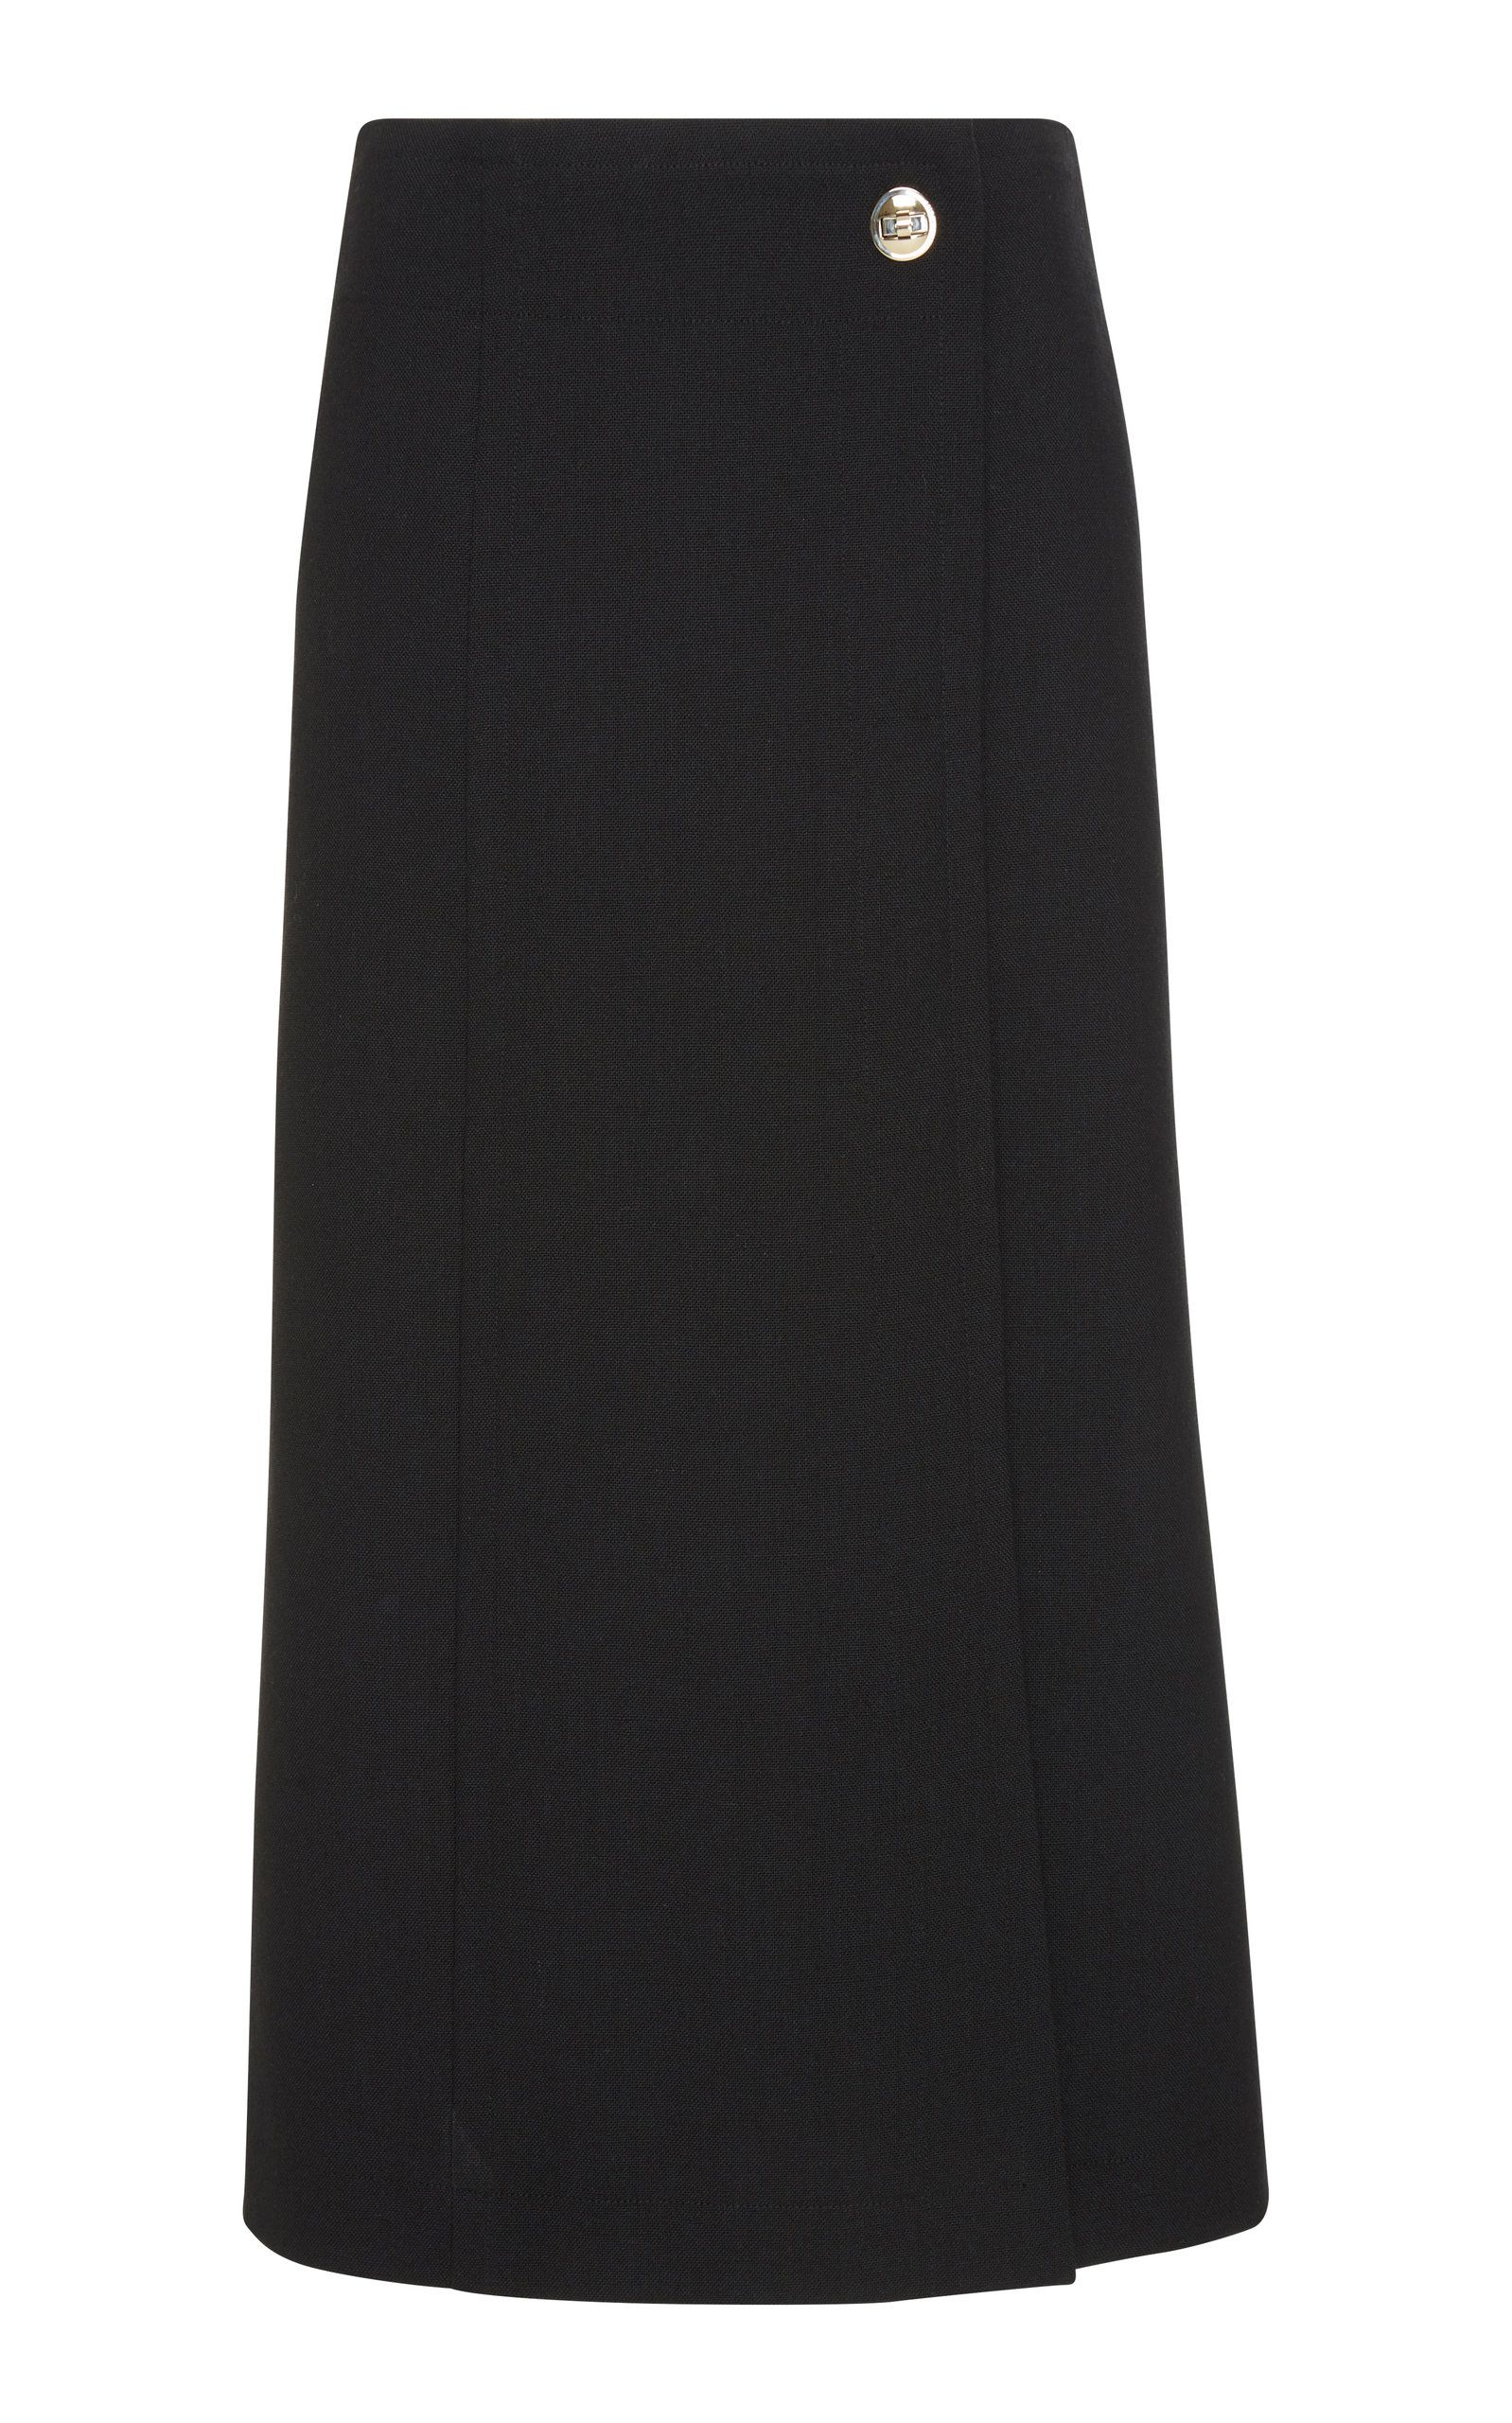 dc84c5dfa Slit Wool-Crepe Midi Wrap Skirt by GIVENCHY Now Available on Moda Operandi